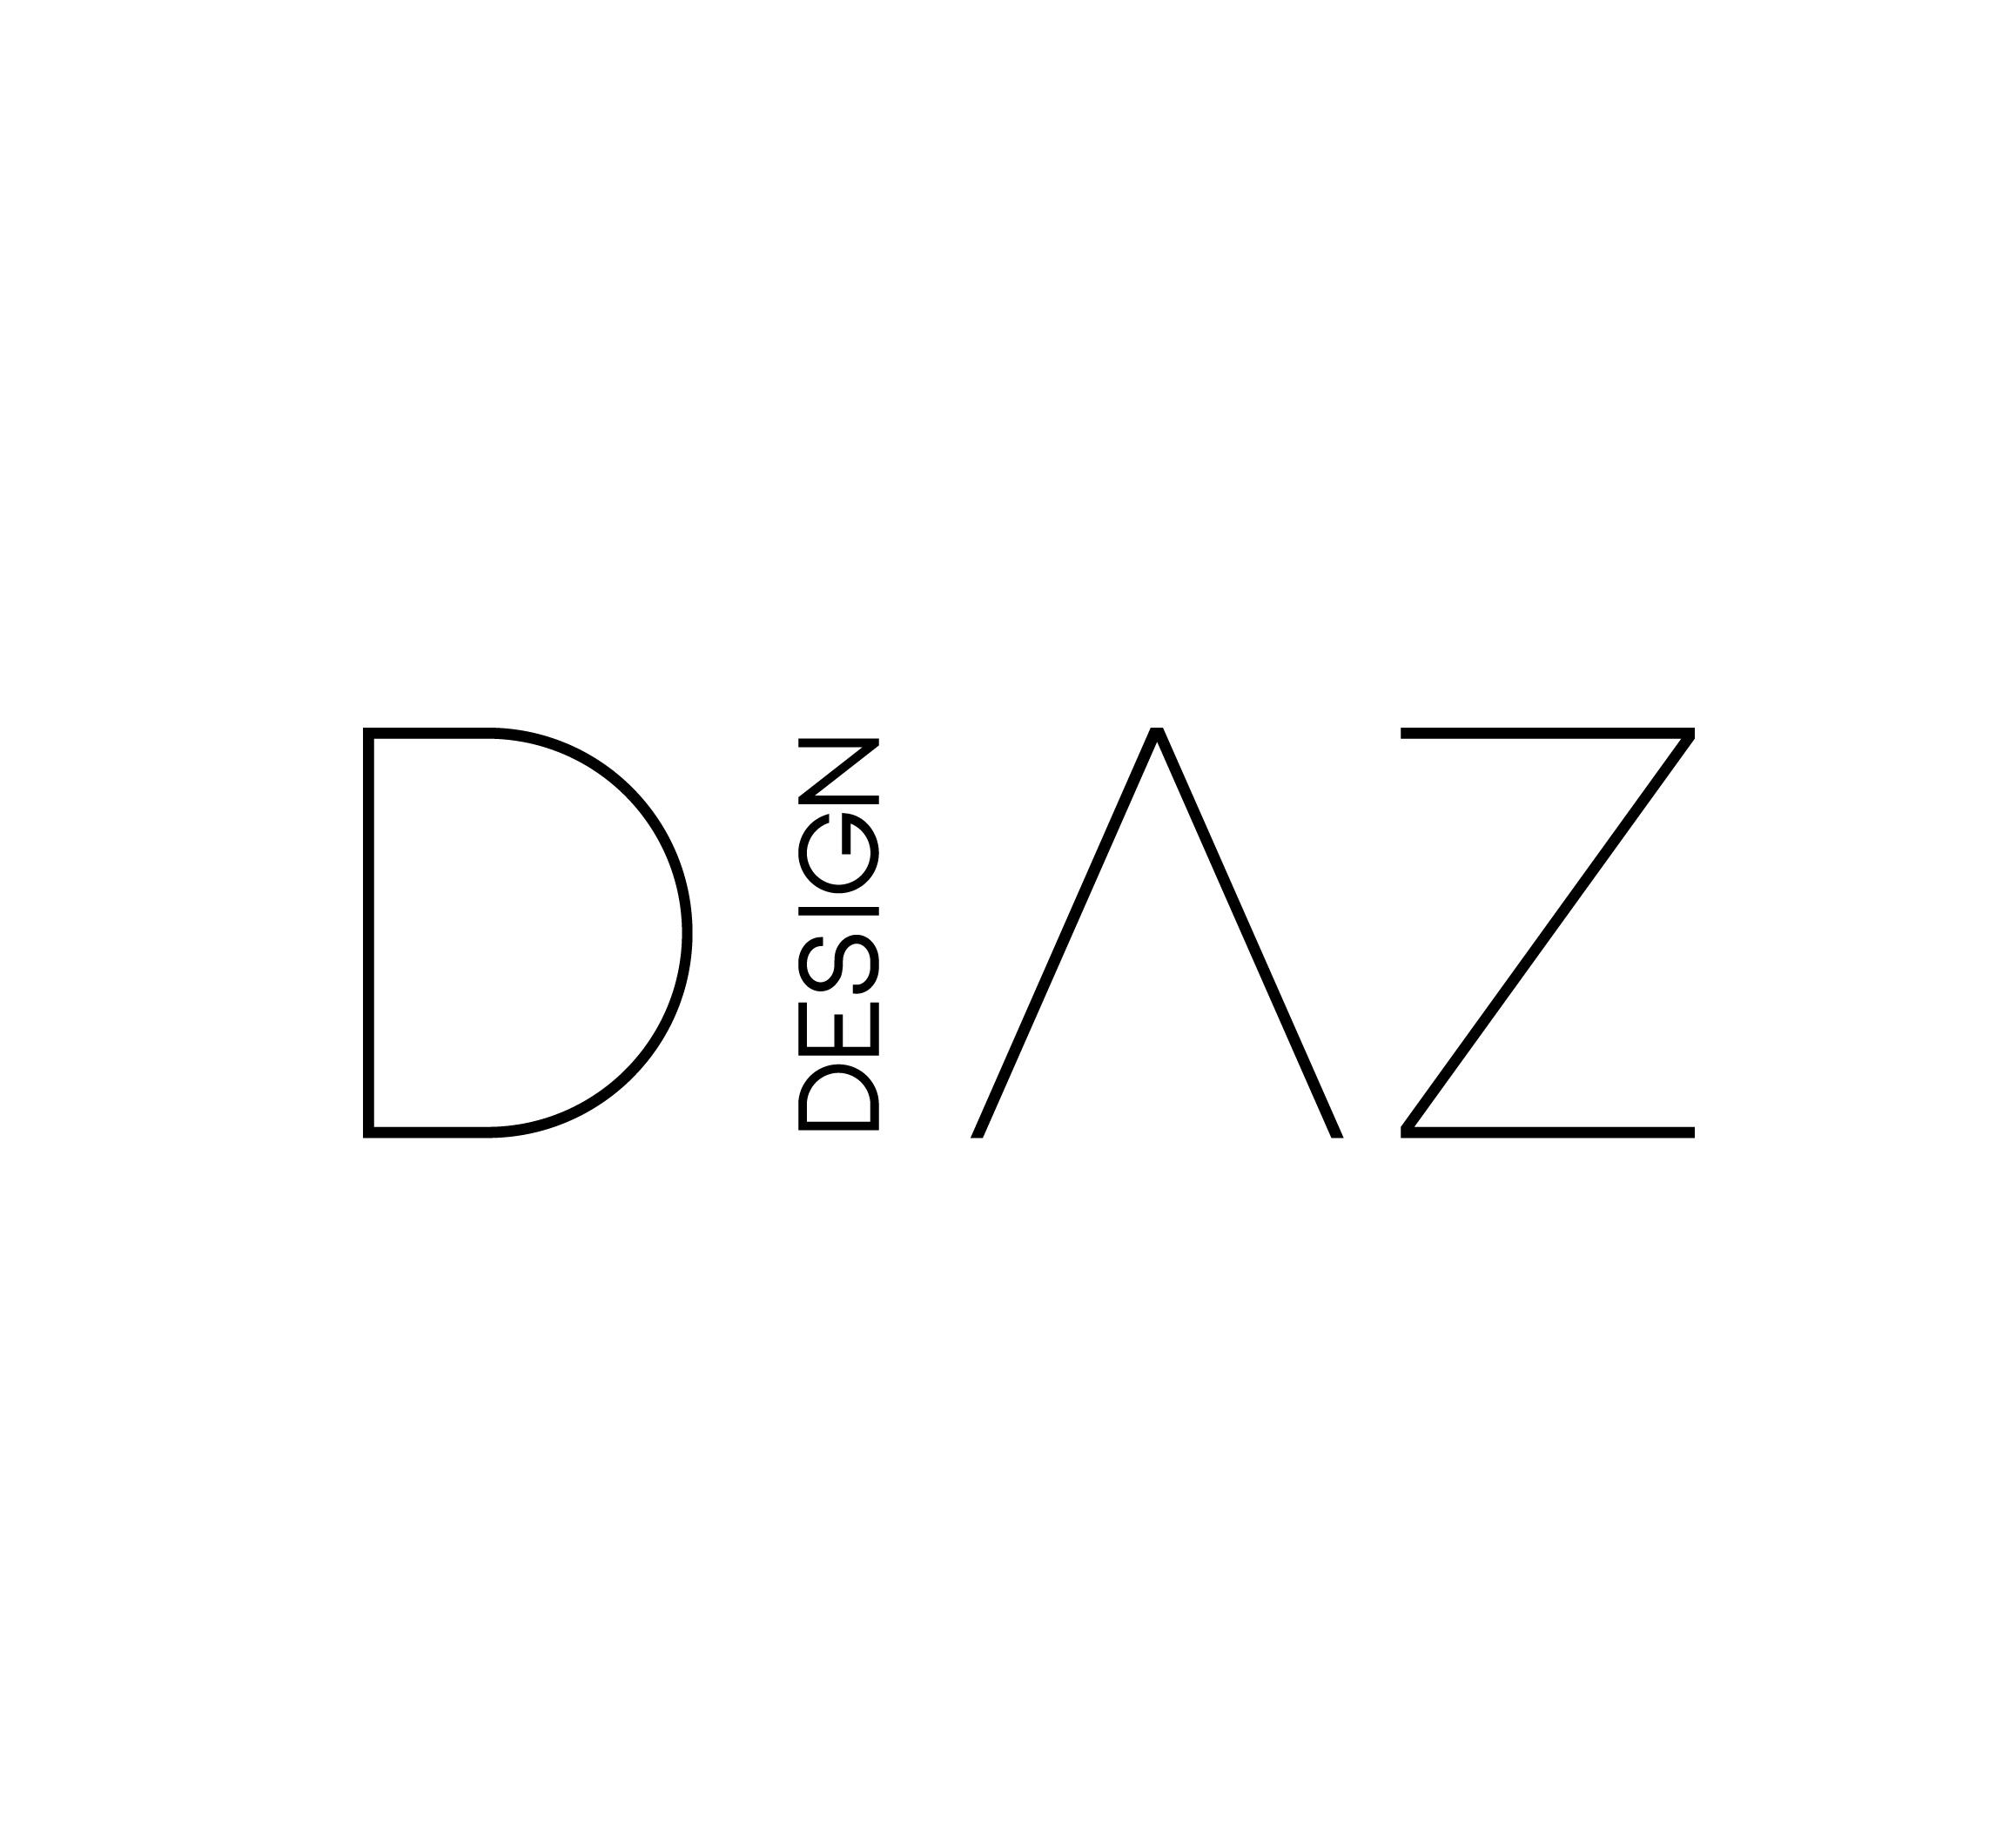 L - DIAZ DESIGN